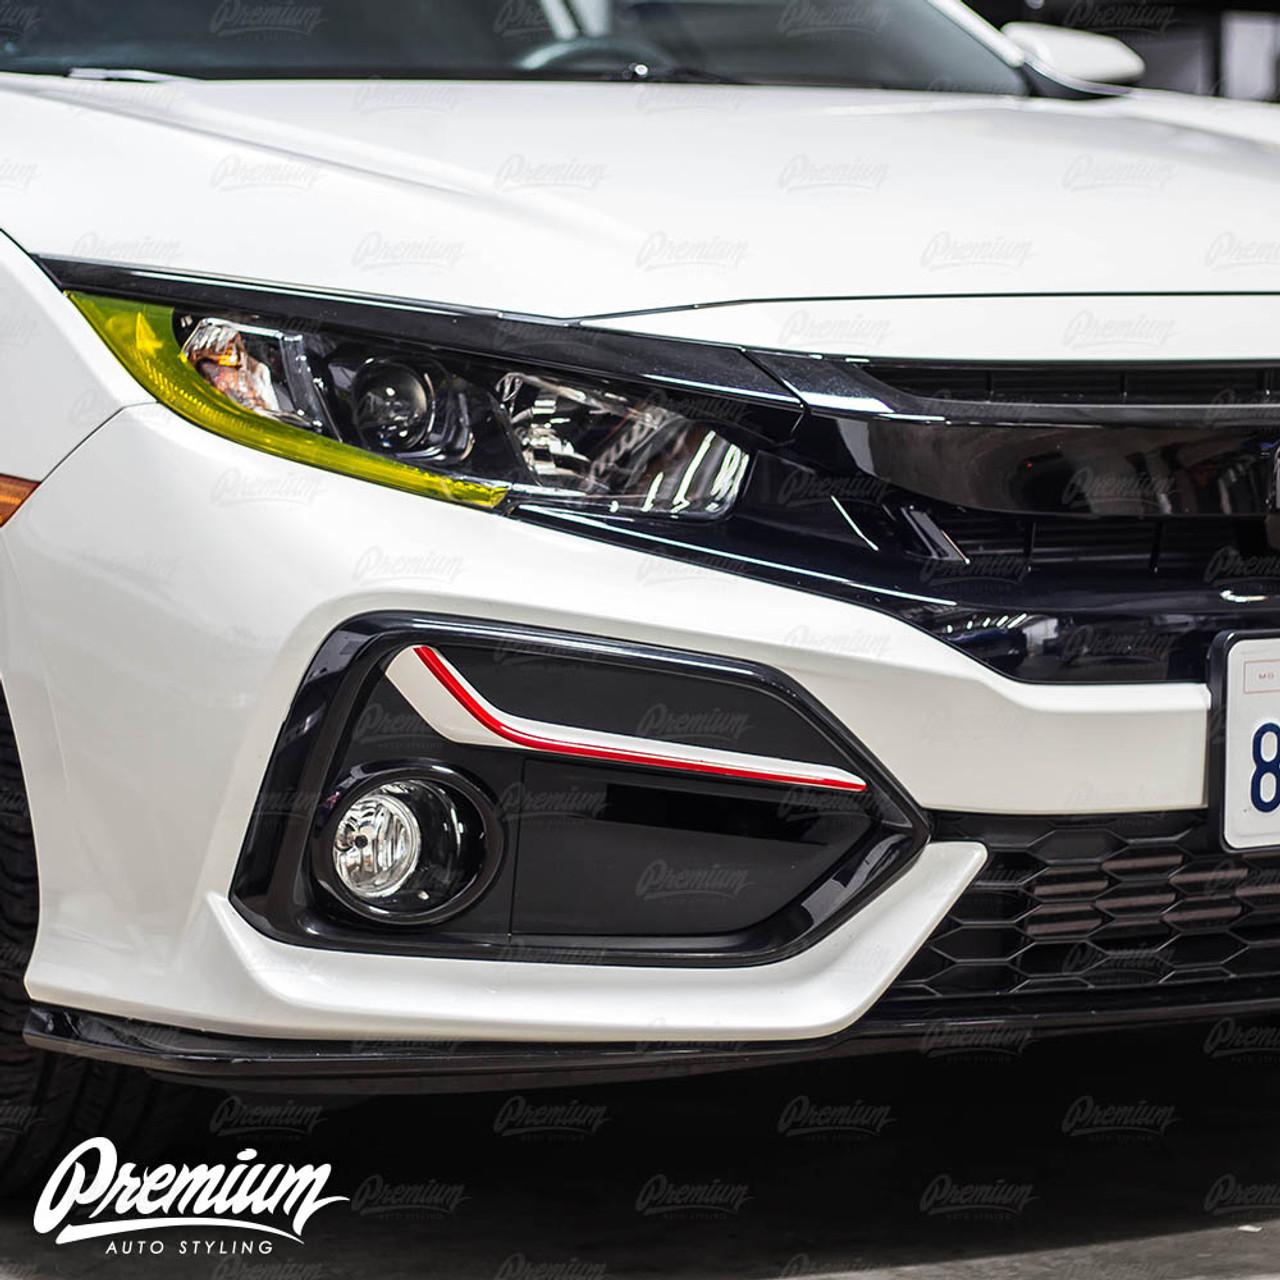 Front Bumper Fog Bezel Pinstripe Choose Your Color 2020 Honda Civic Sedan Si Coupe Si Hatch Type R Premium Auto Styling